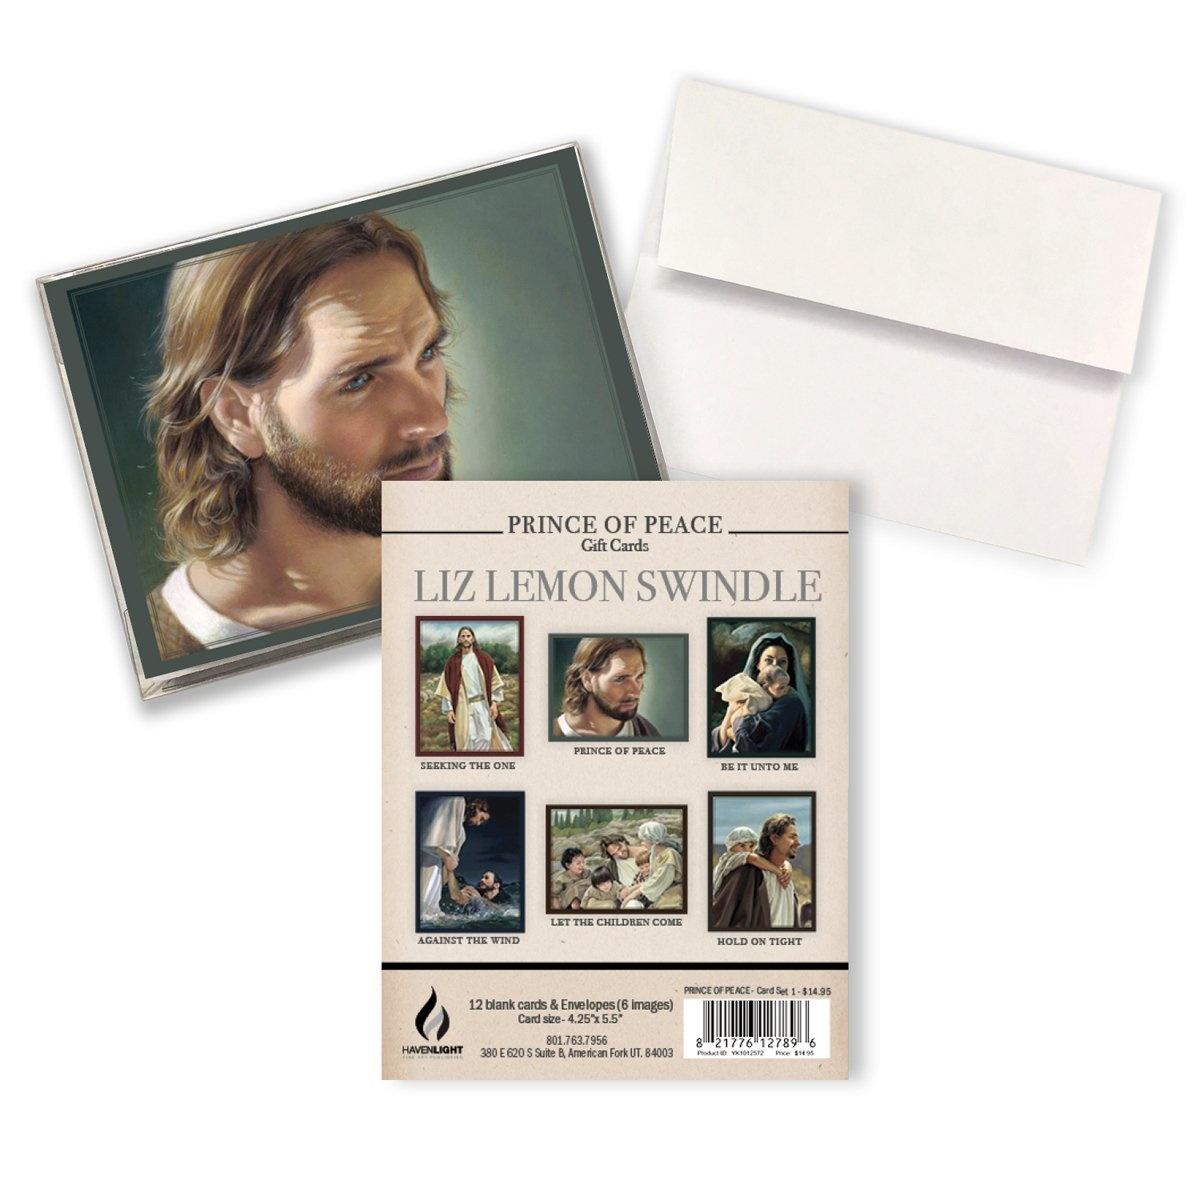 Prince of Peace Gift Card Set 1 - Liz Lemon Swindle